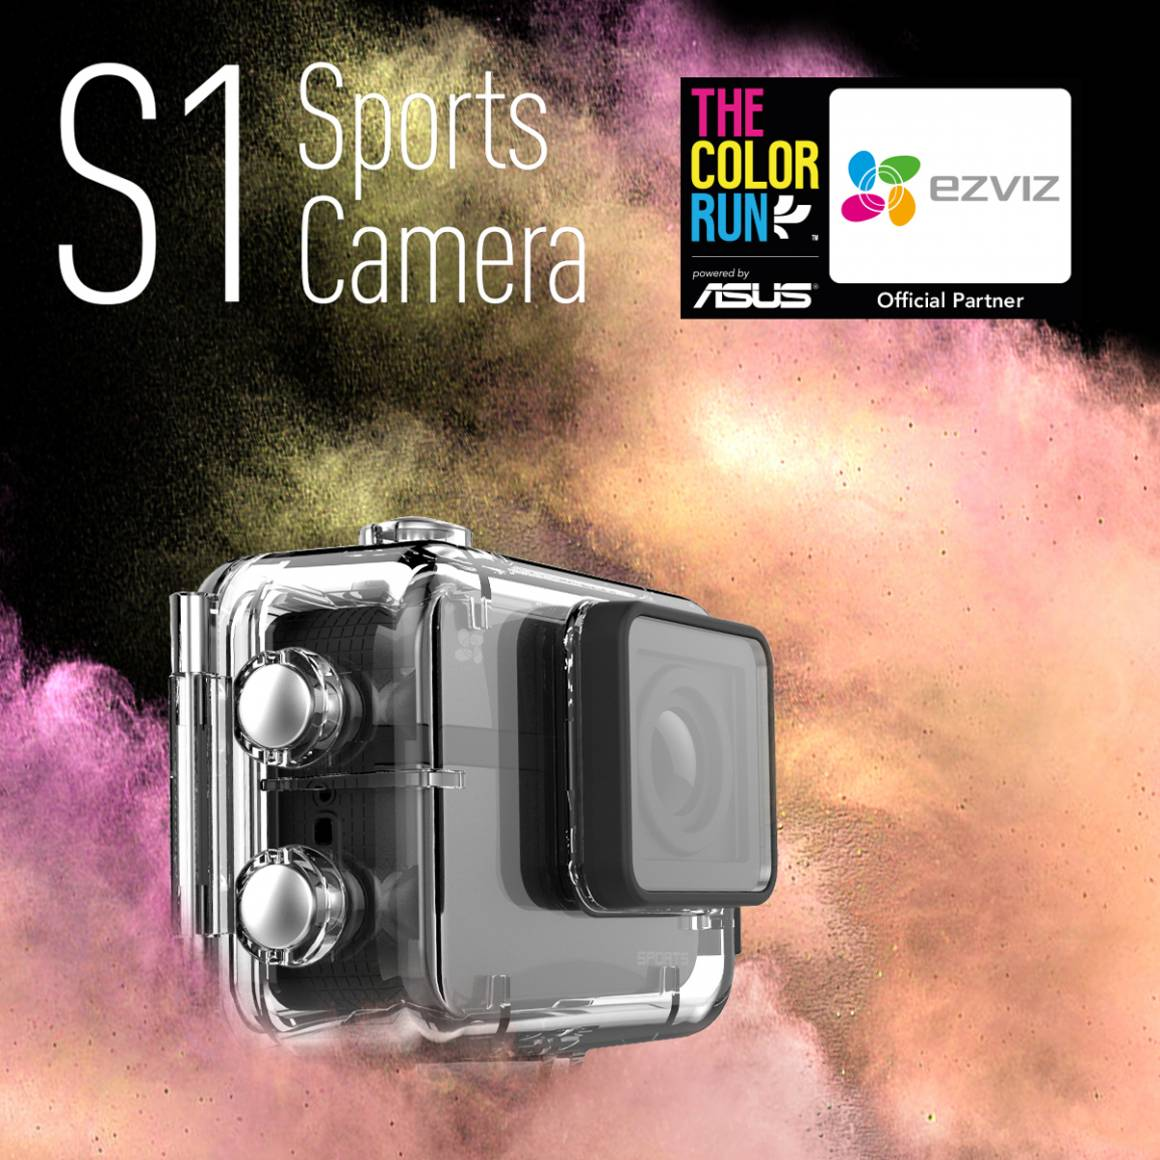 S1 colorrun 1160x1160 - Color Run 2015: ezviz official support